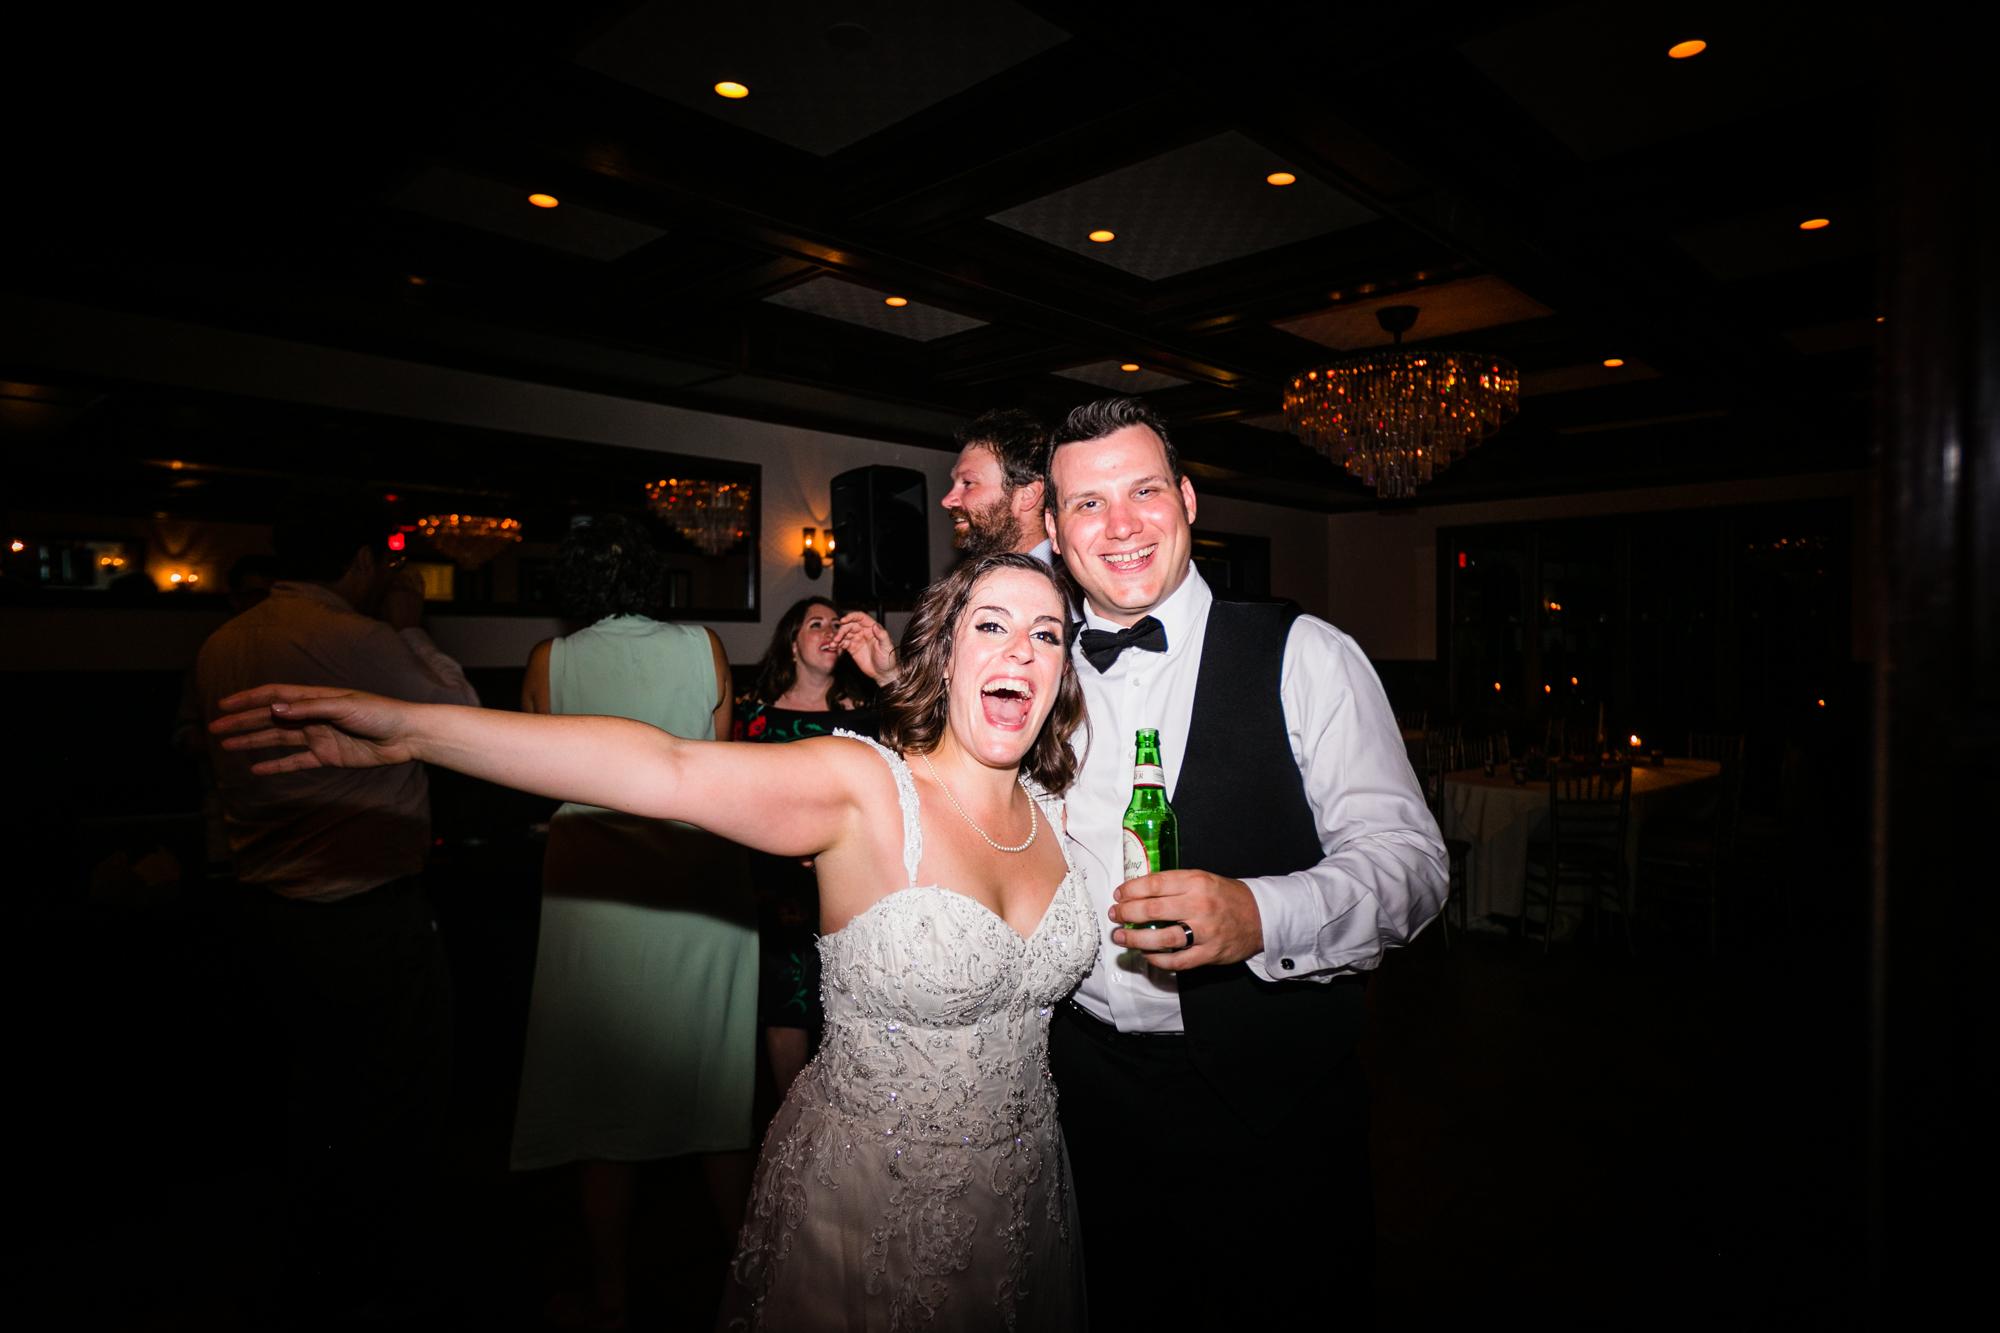 Hotel Du Village - LoveStruck Pictures - Wedding Photography-114.jpg